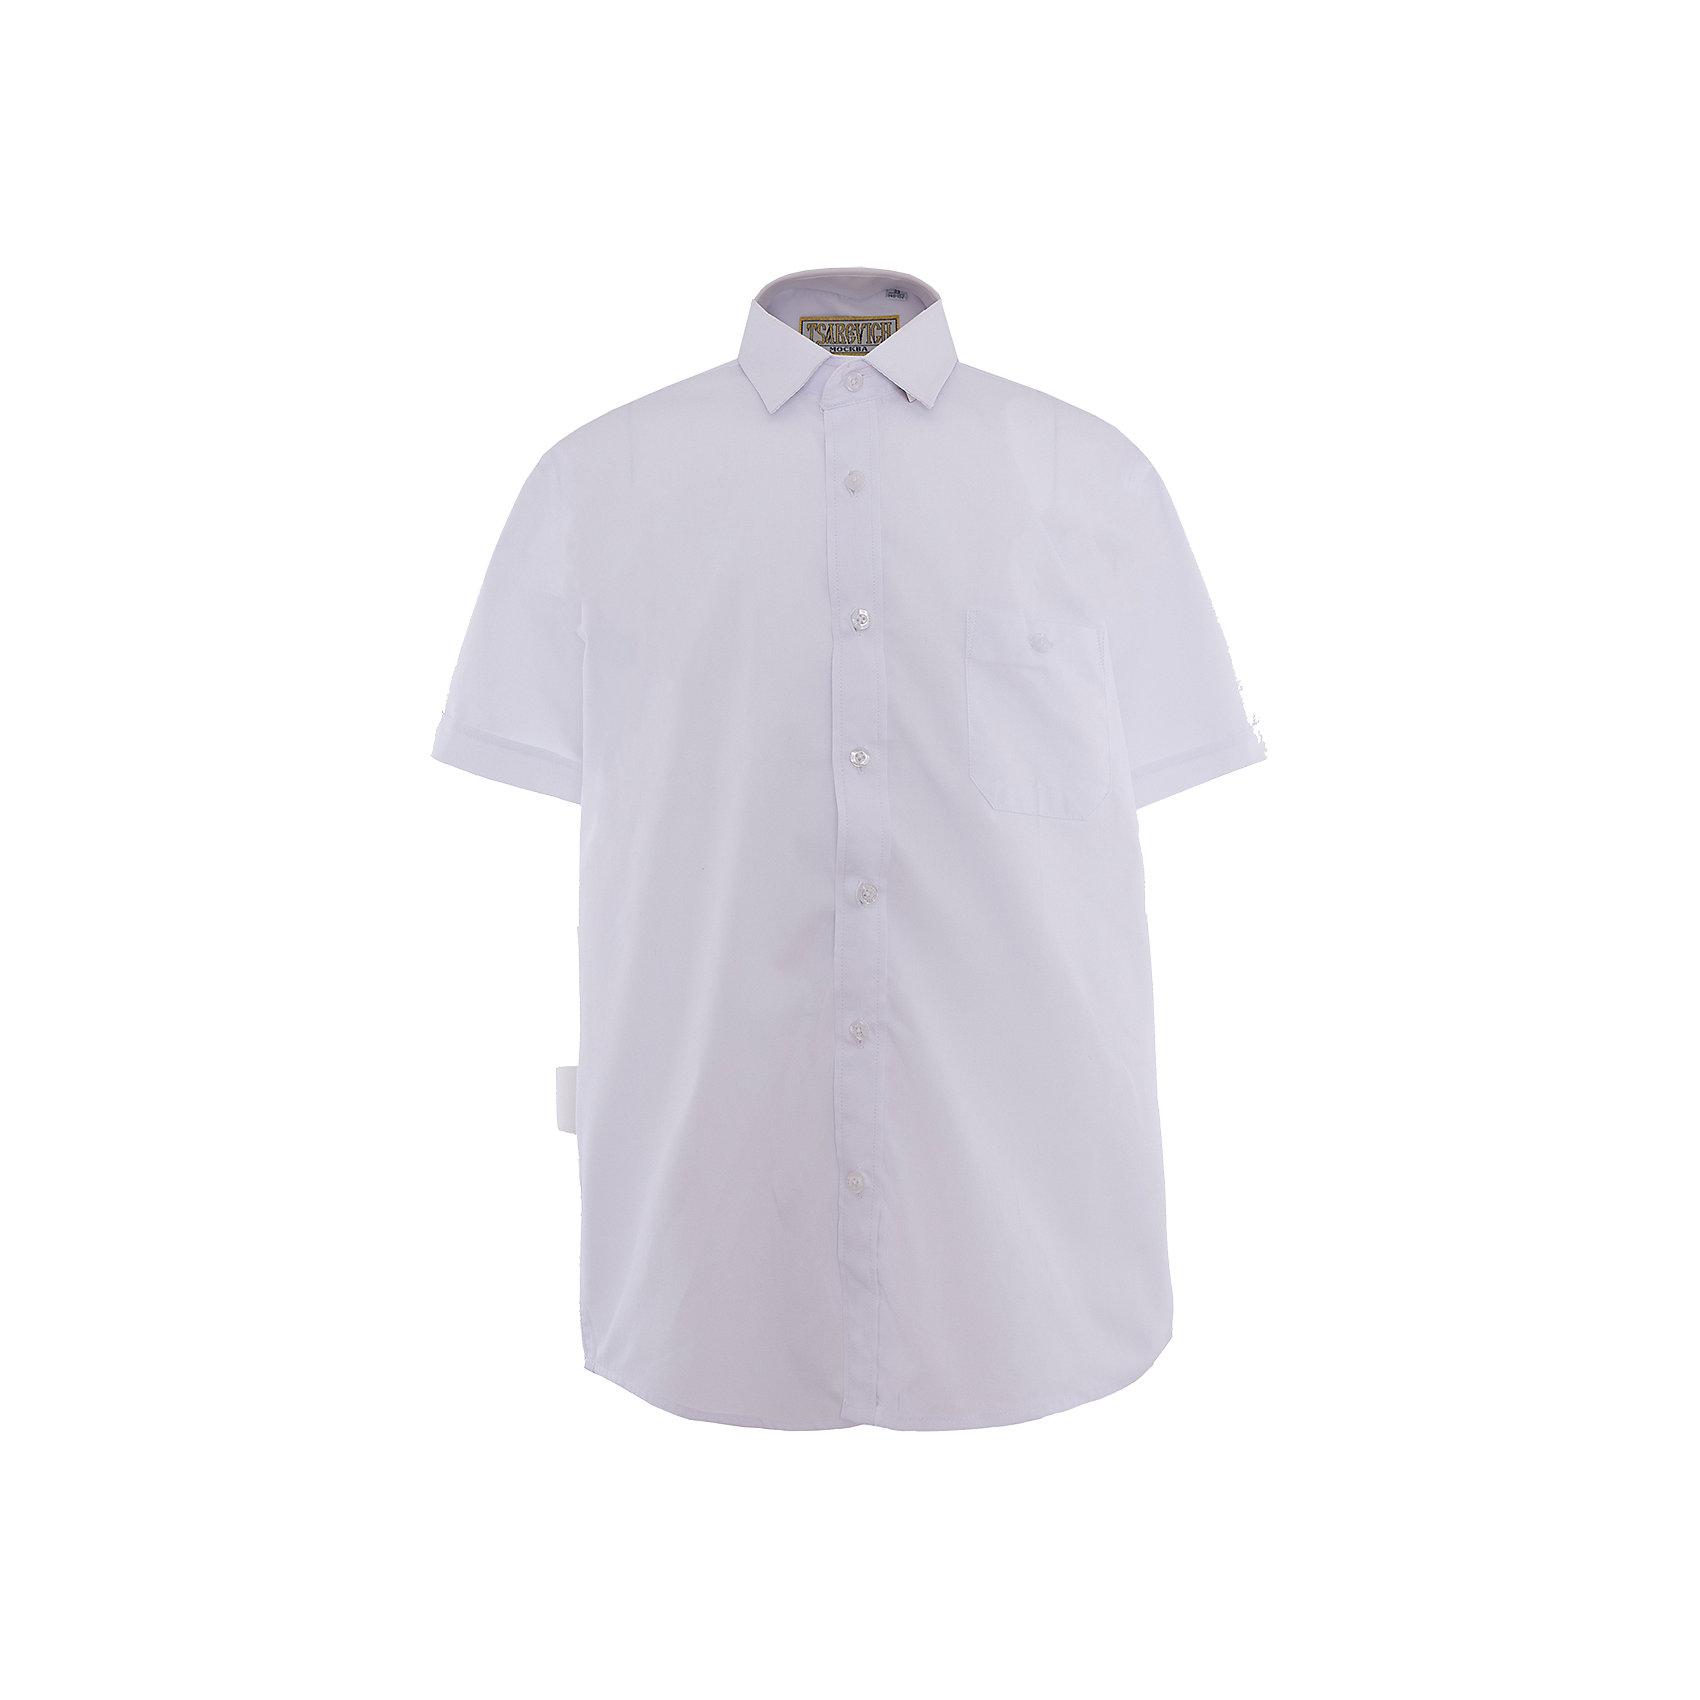 Tsarevich Рубашка для мальчика  Tsarevich